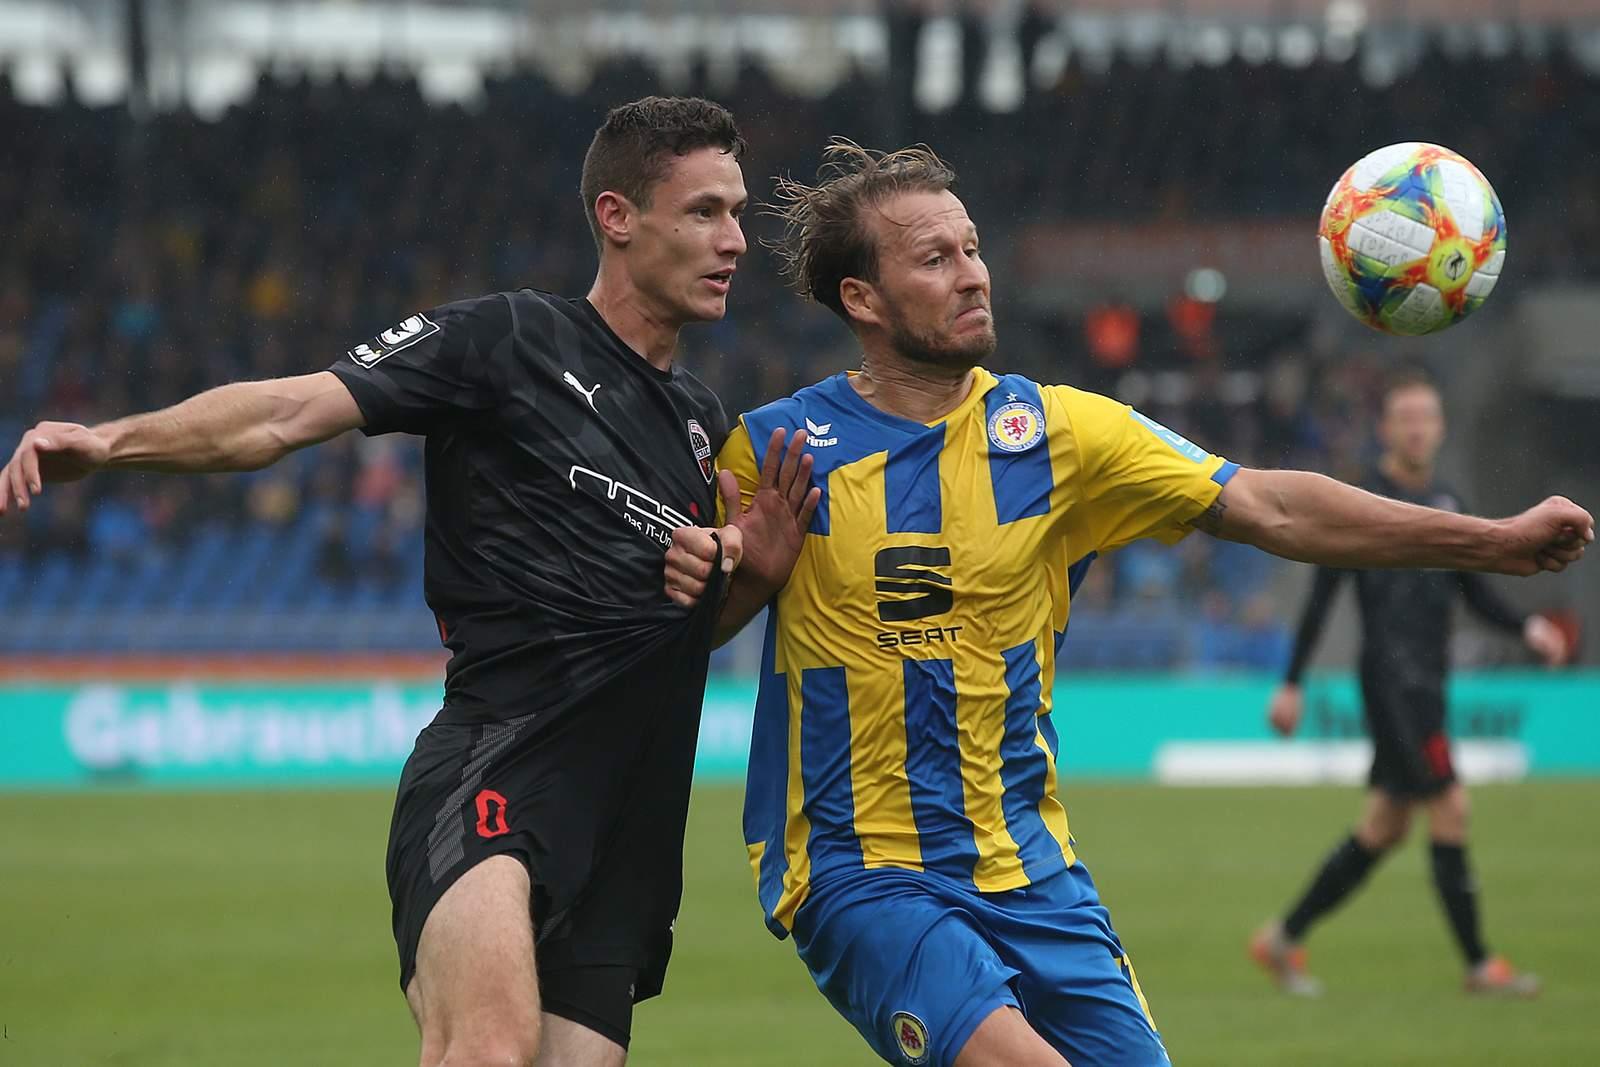 Braunschweigs Marc Pfitzner (r.) gegen Ingolstadts Maximilian Thalhammer.